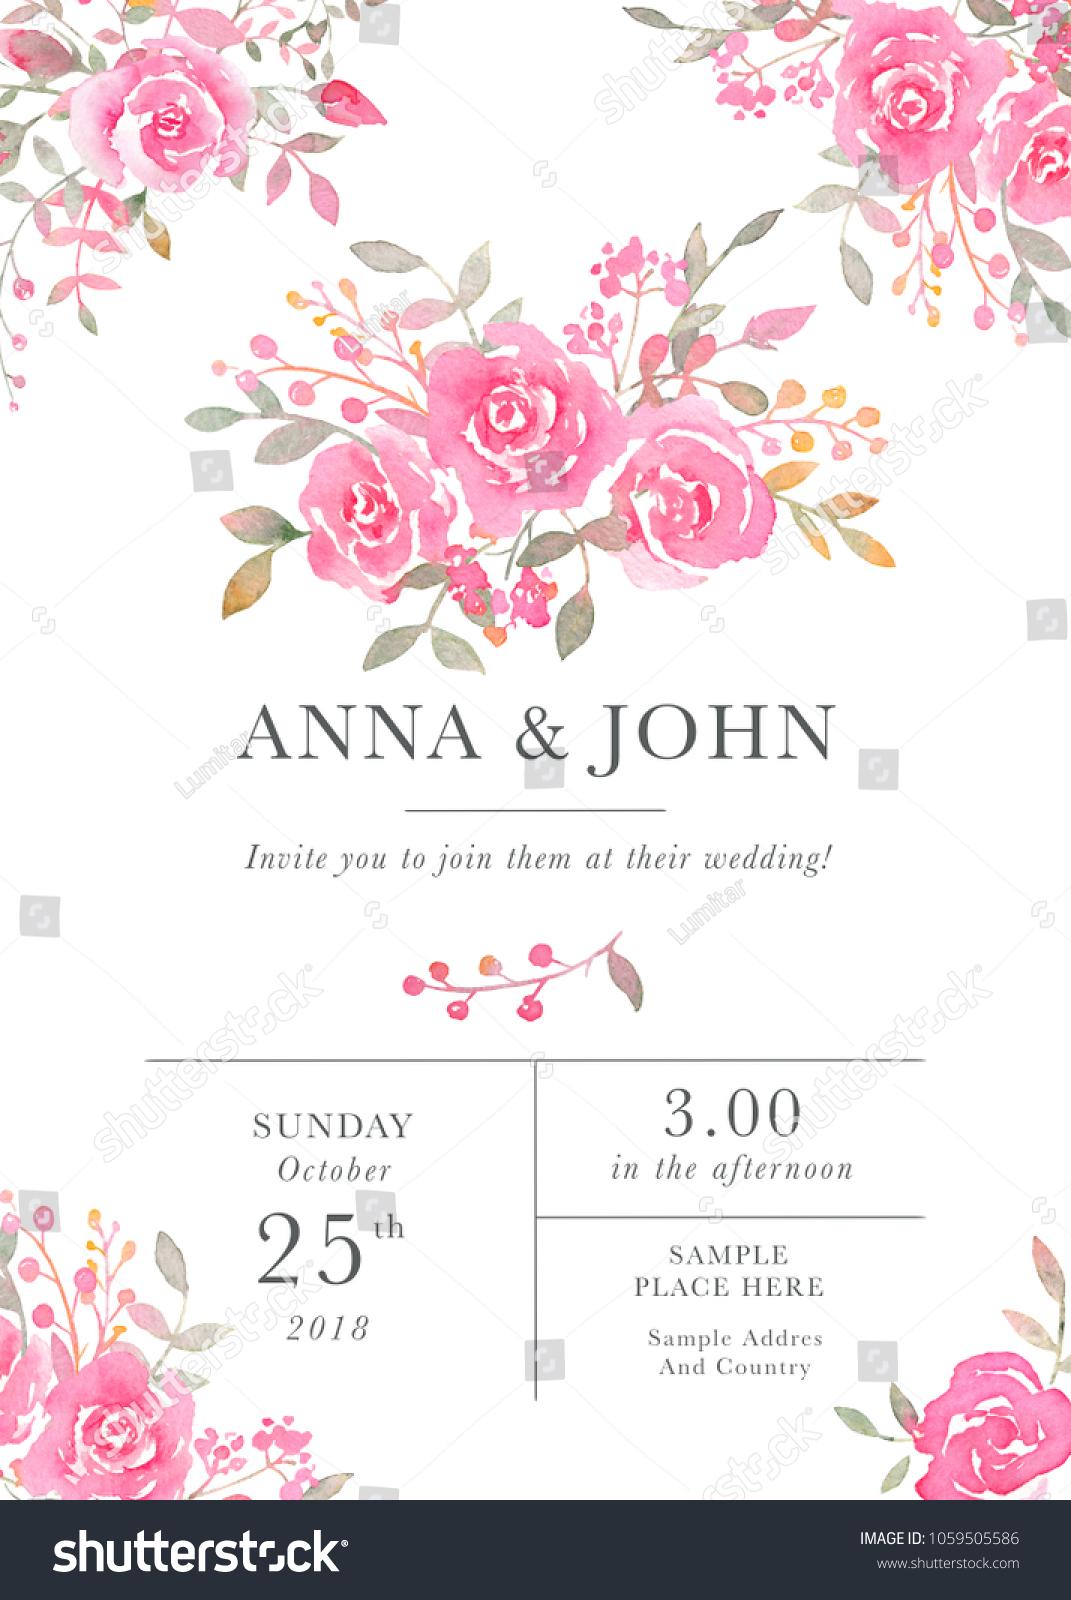 Wedding Invitation Card Template Watercolor Rose Stock Illustration ...